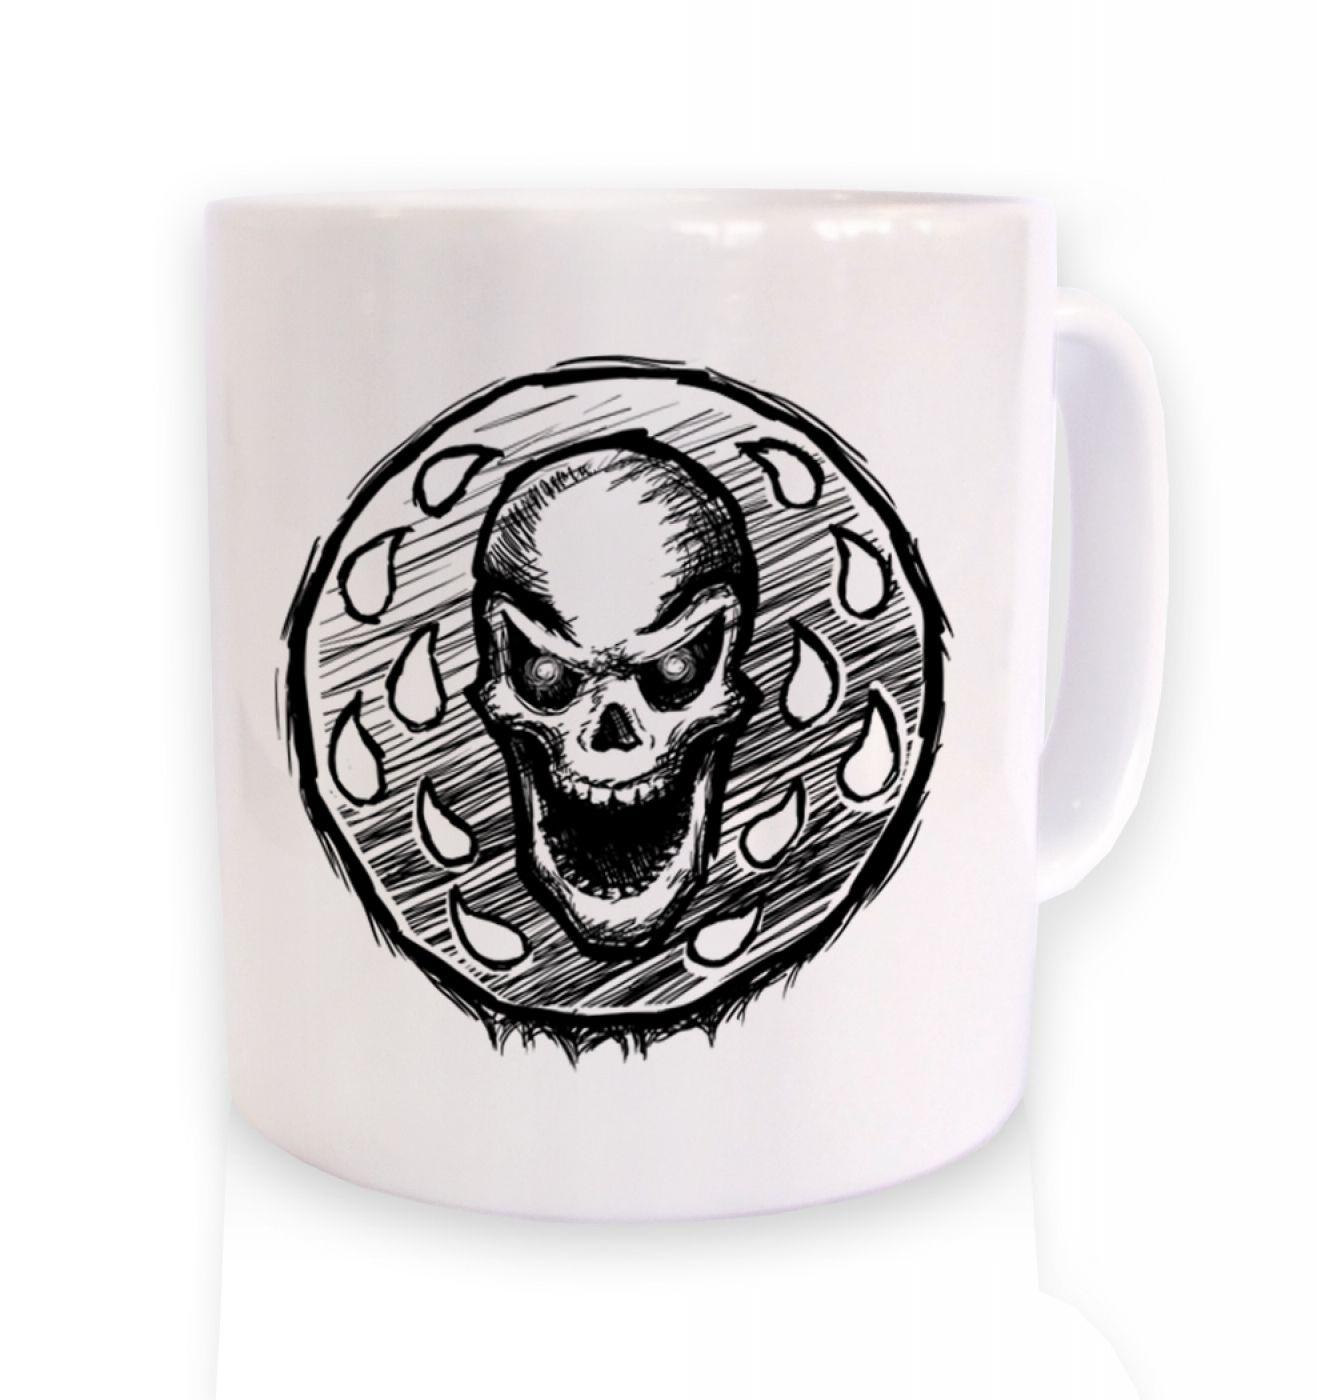 Skull Coin ceramic coffee mug